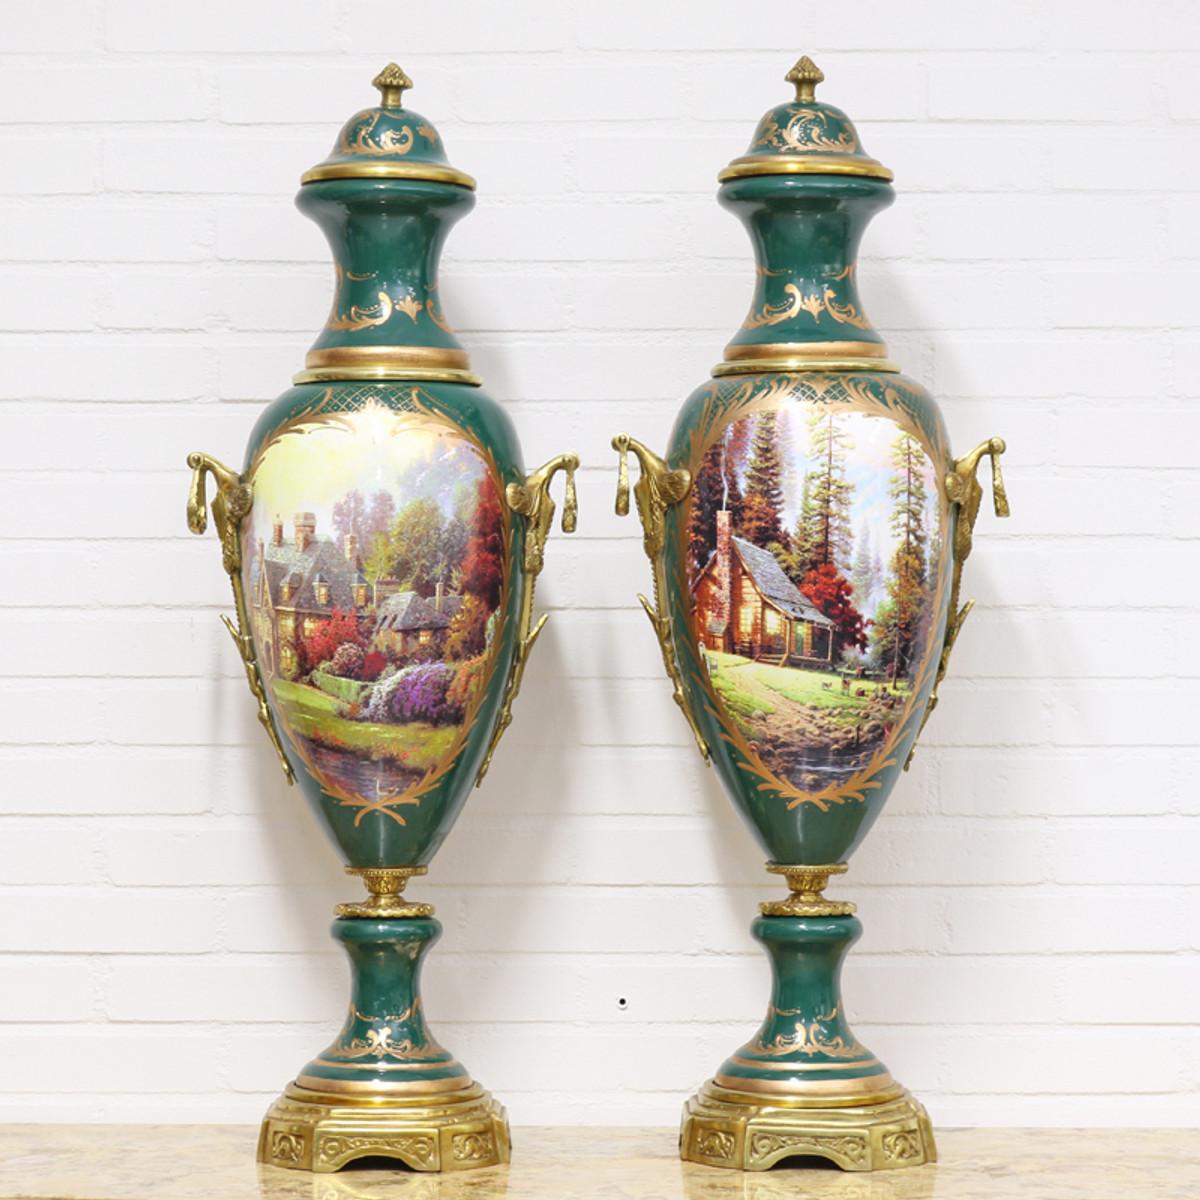 Casa Padrino Deko Vasen Grün / Gold 30 x H. 100 cm - Barockstil Porzellan Vasen Set 1